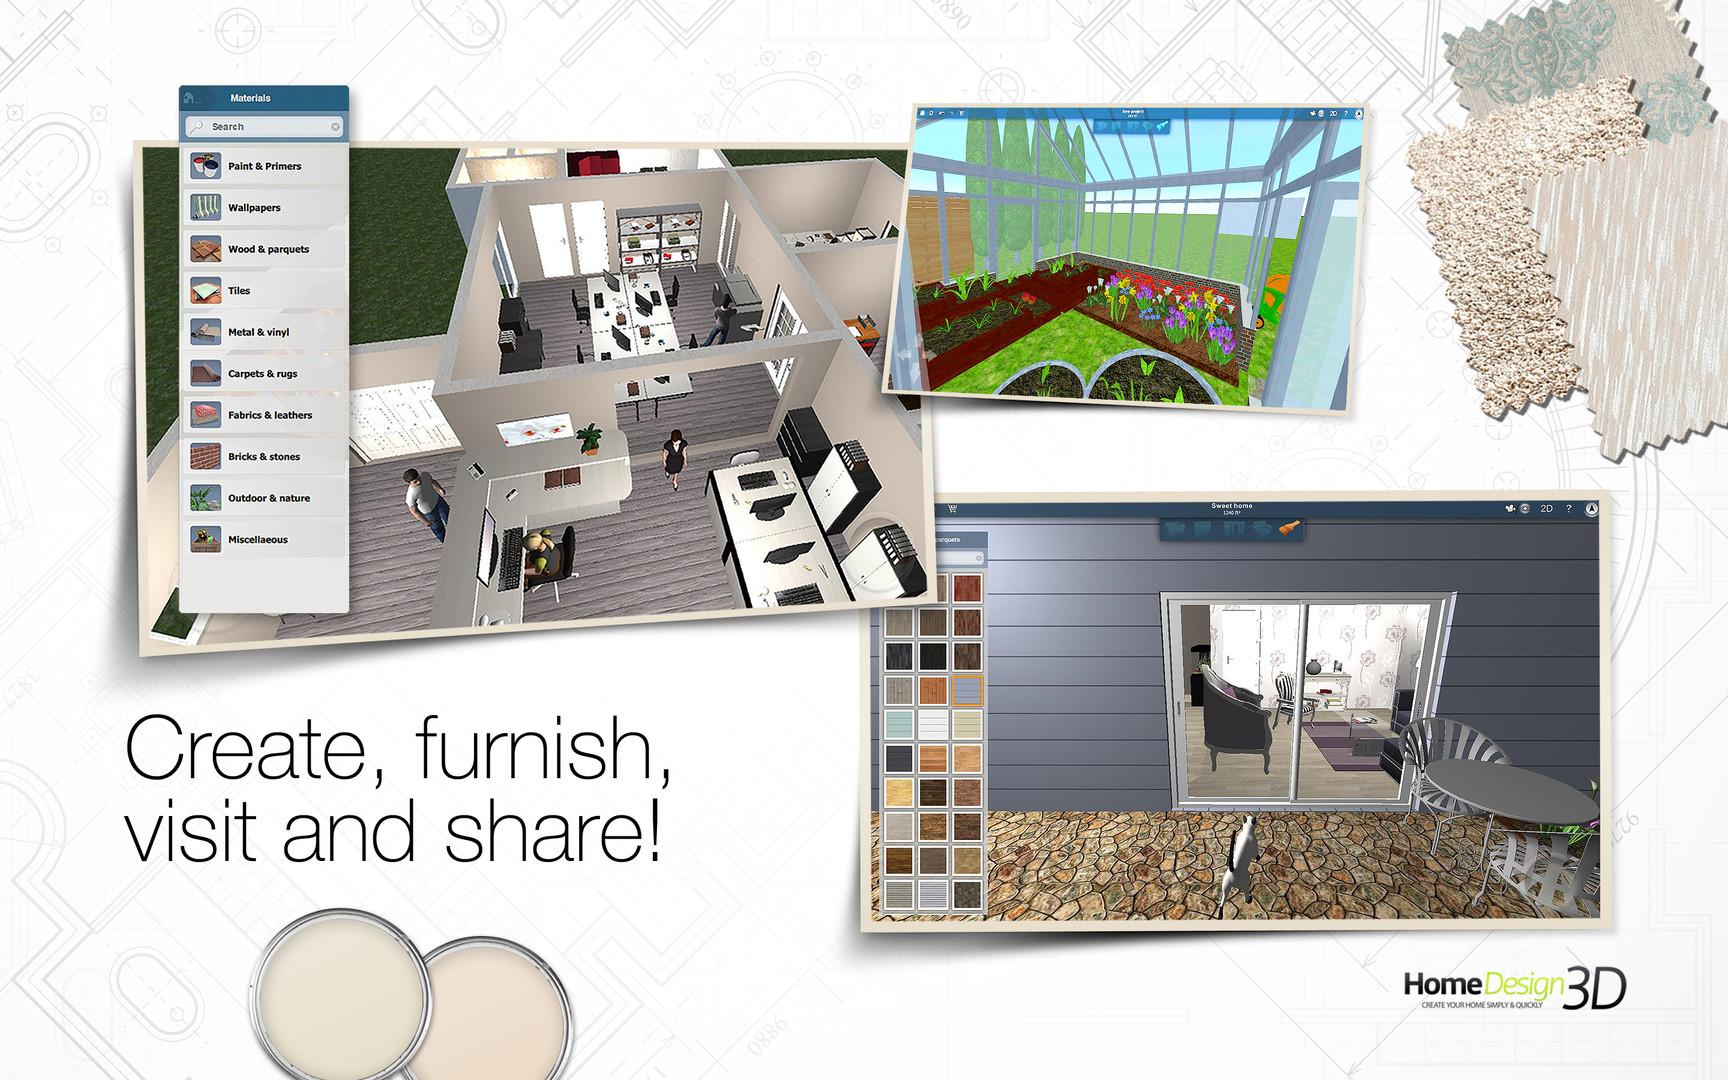 Best Free 3d Home Design Software 2015